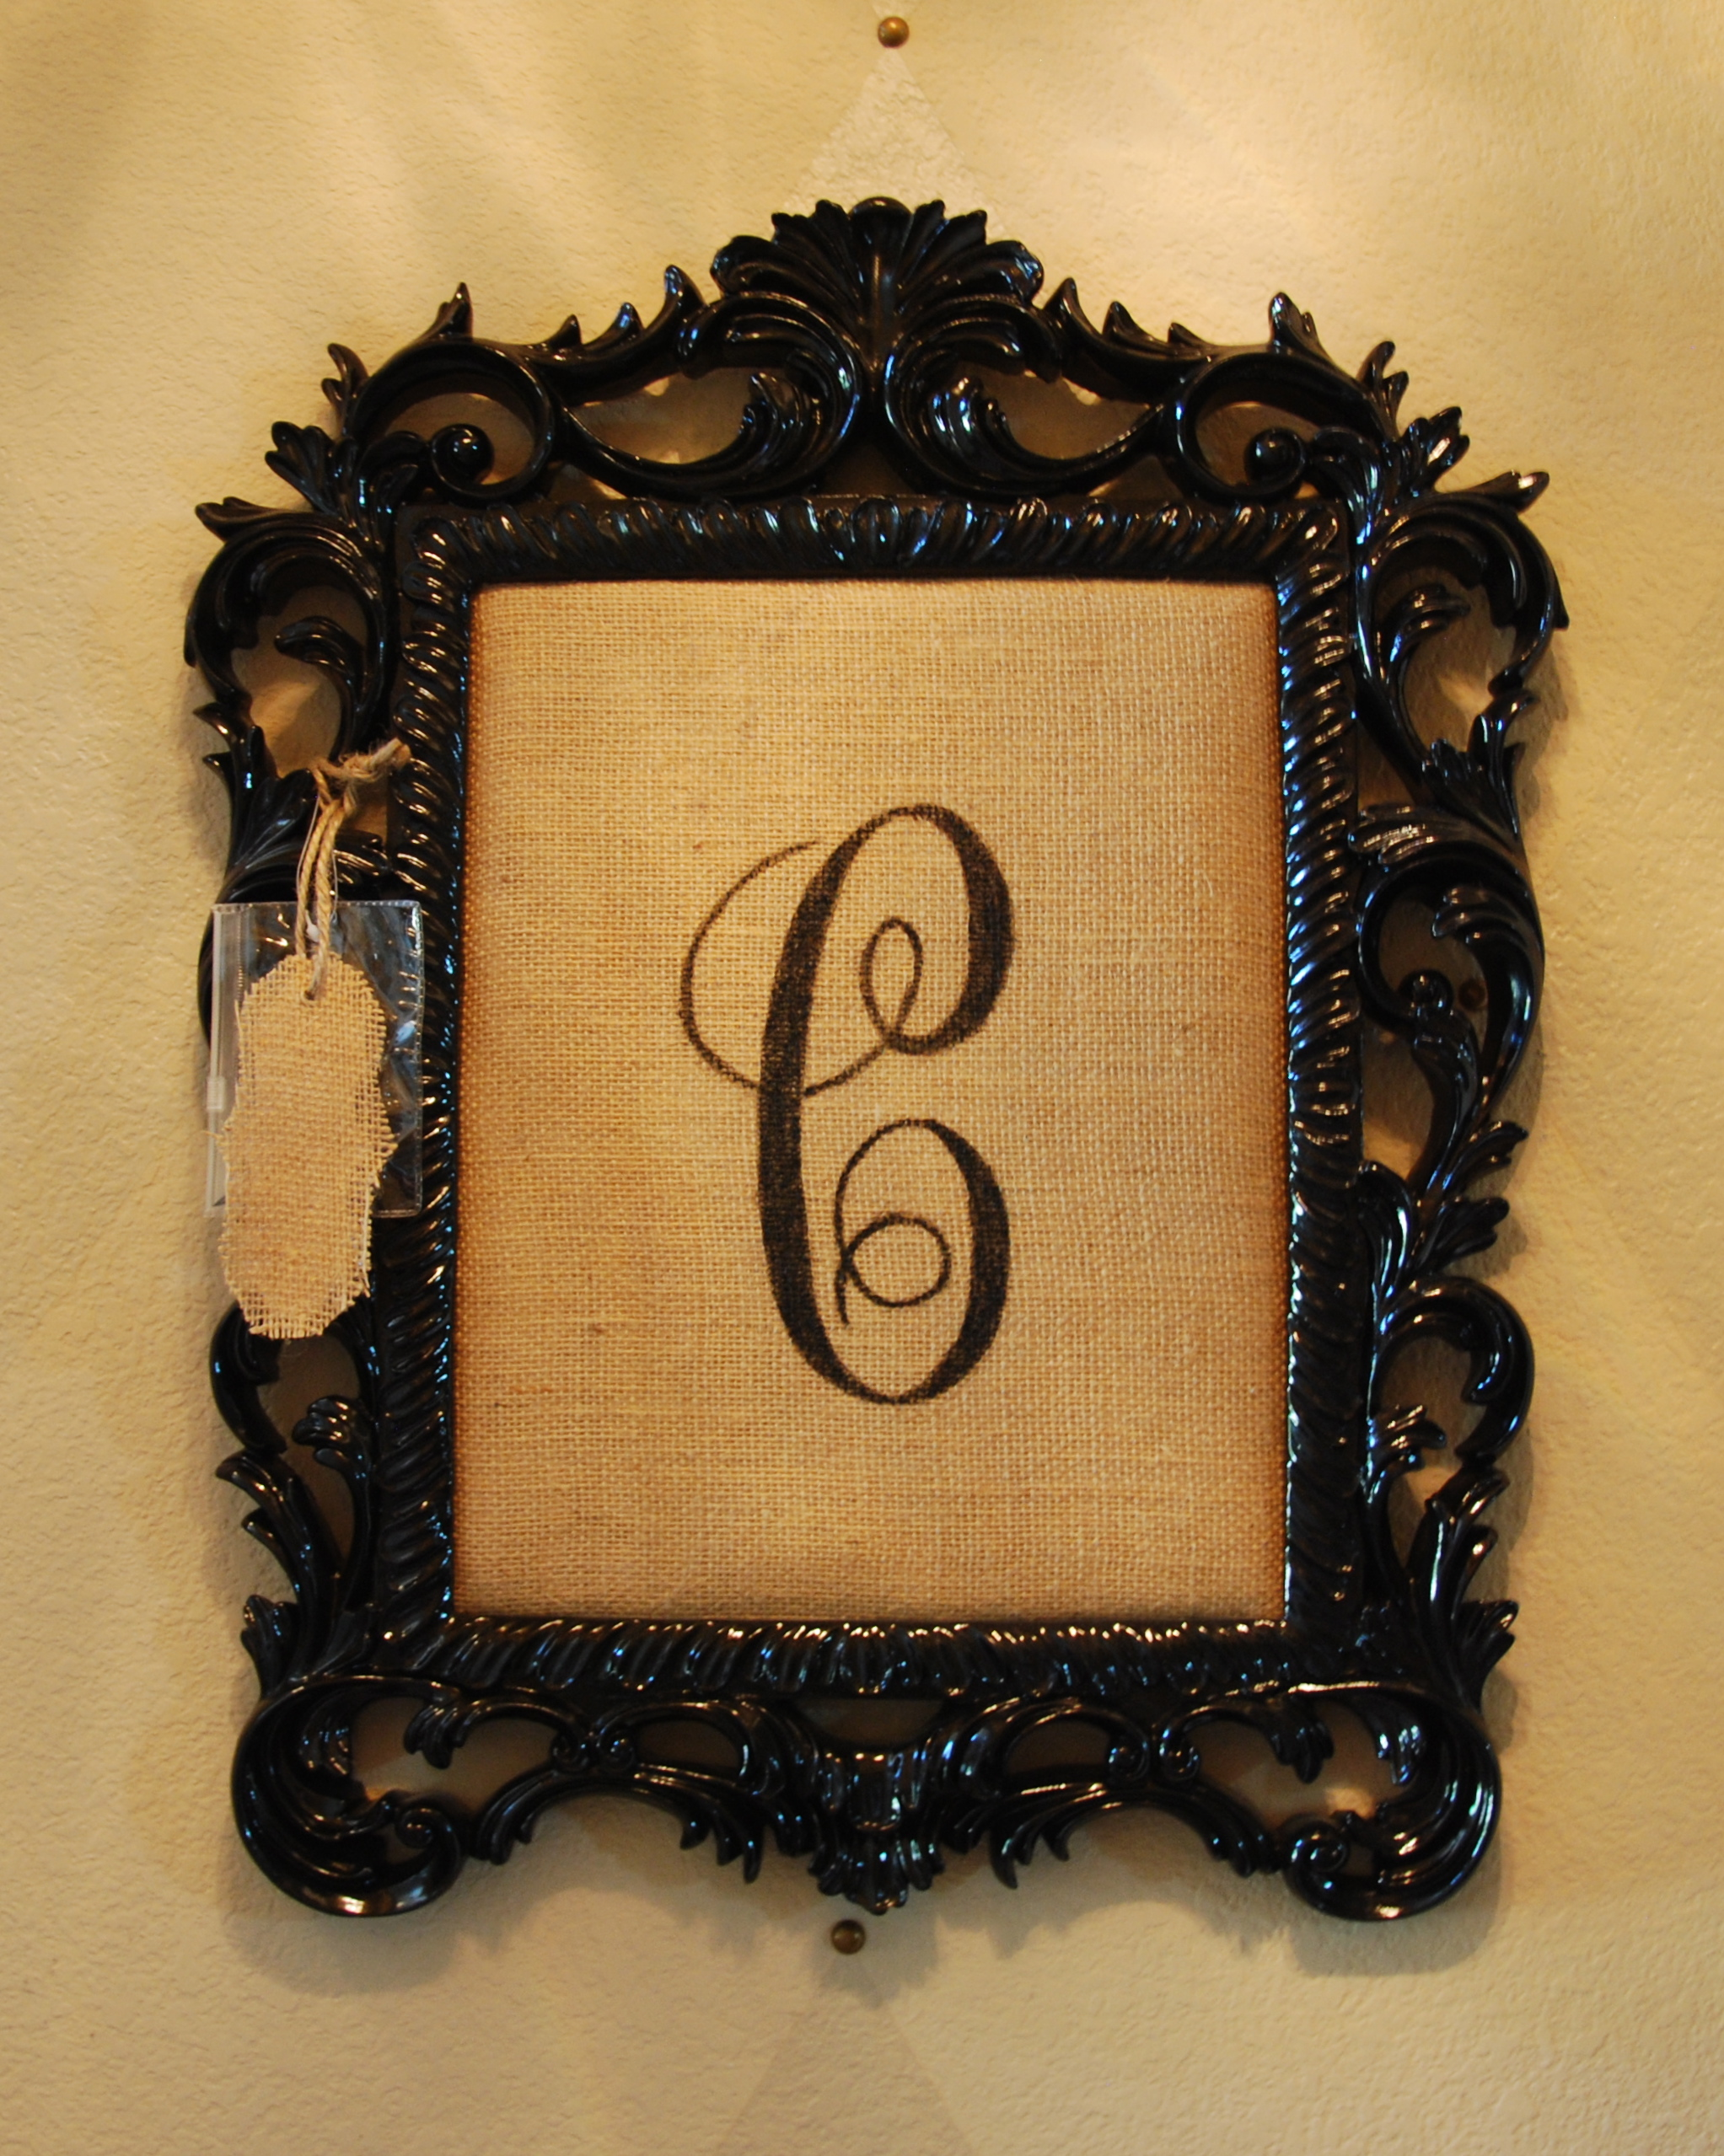 Black Lacquer Monogram - Sold